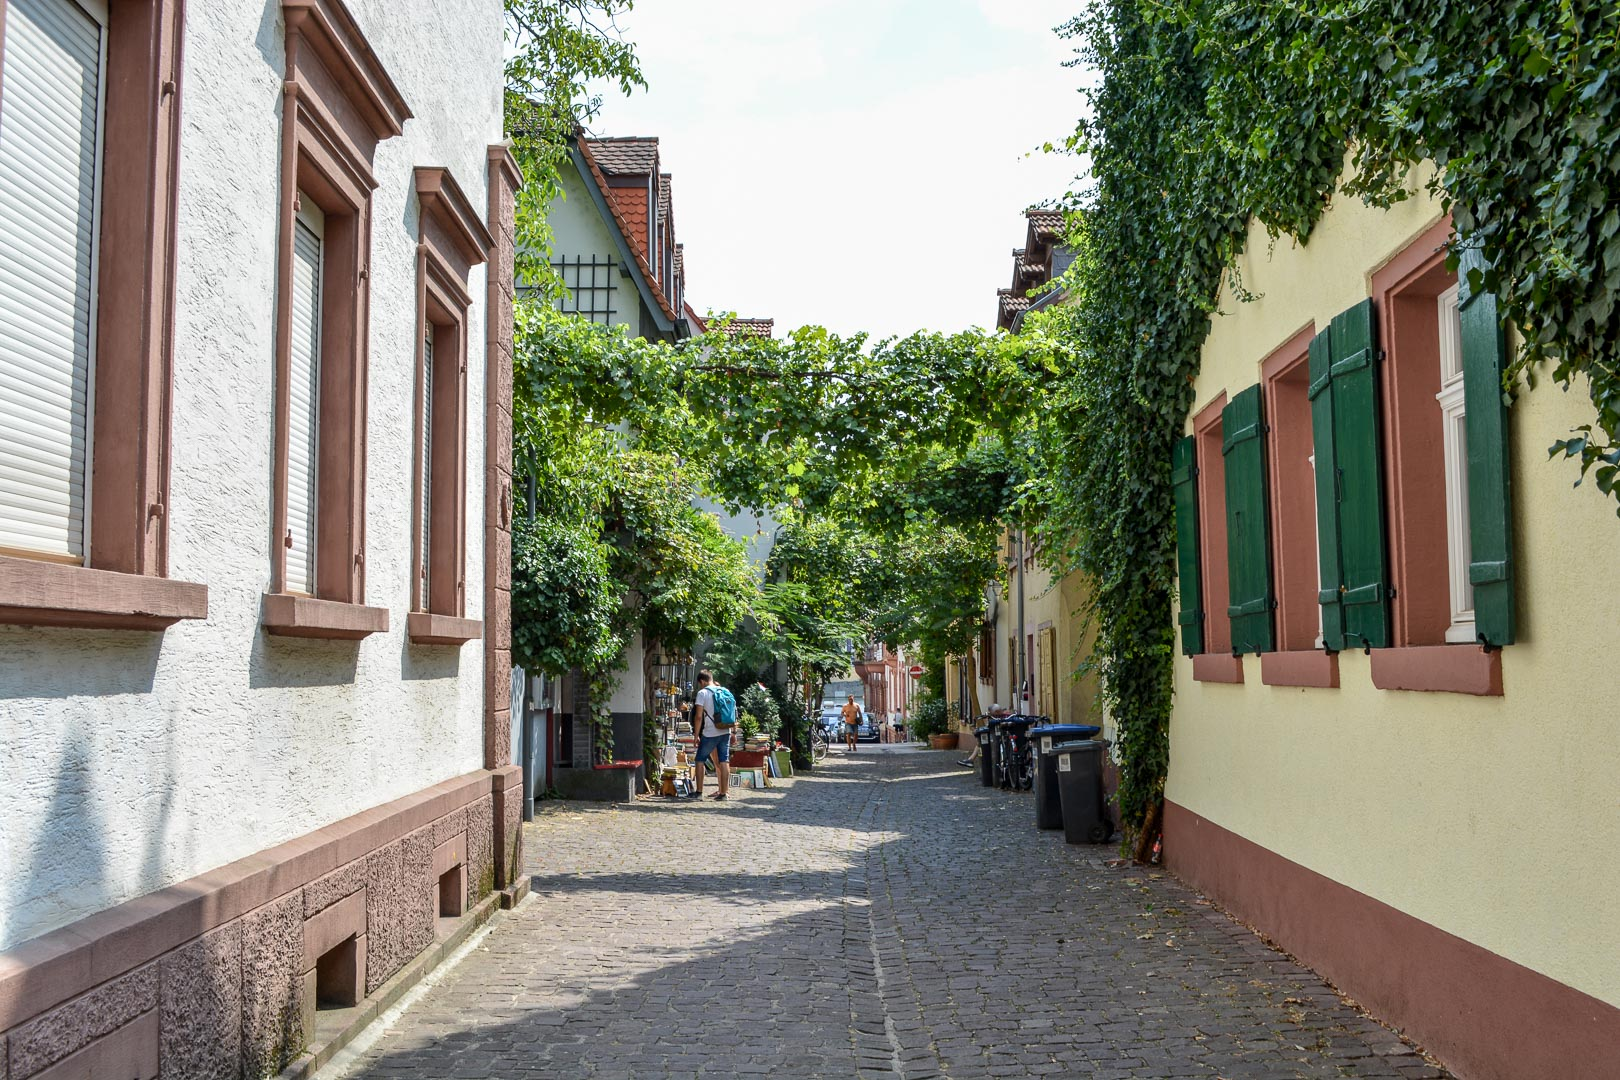 Charming Heidelberg Old Town